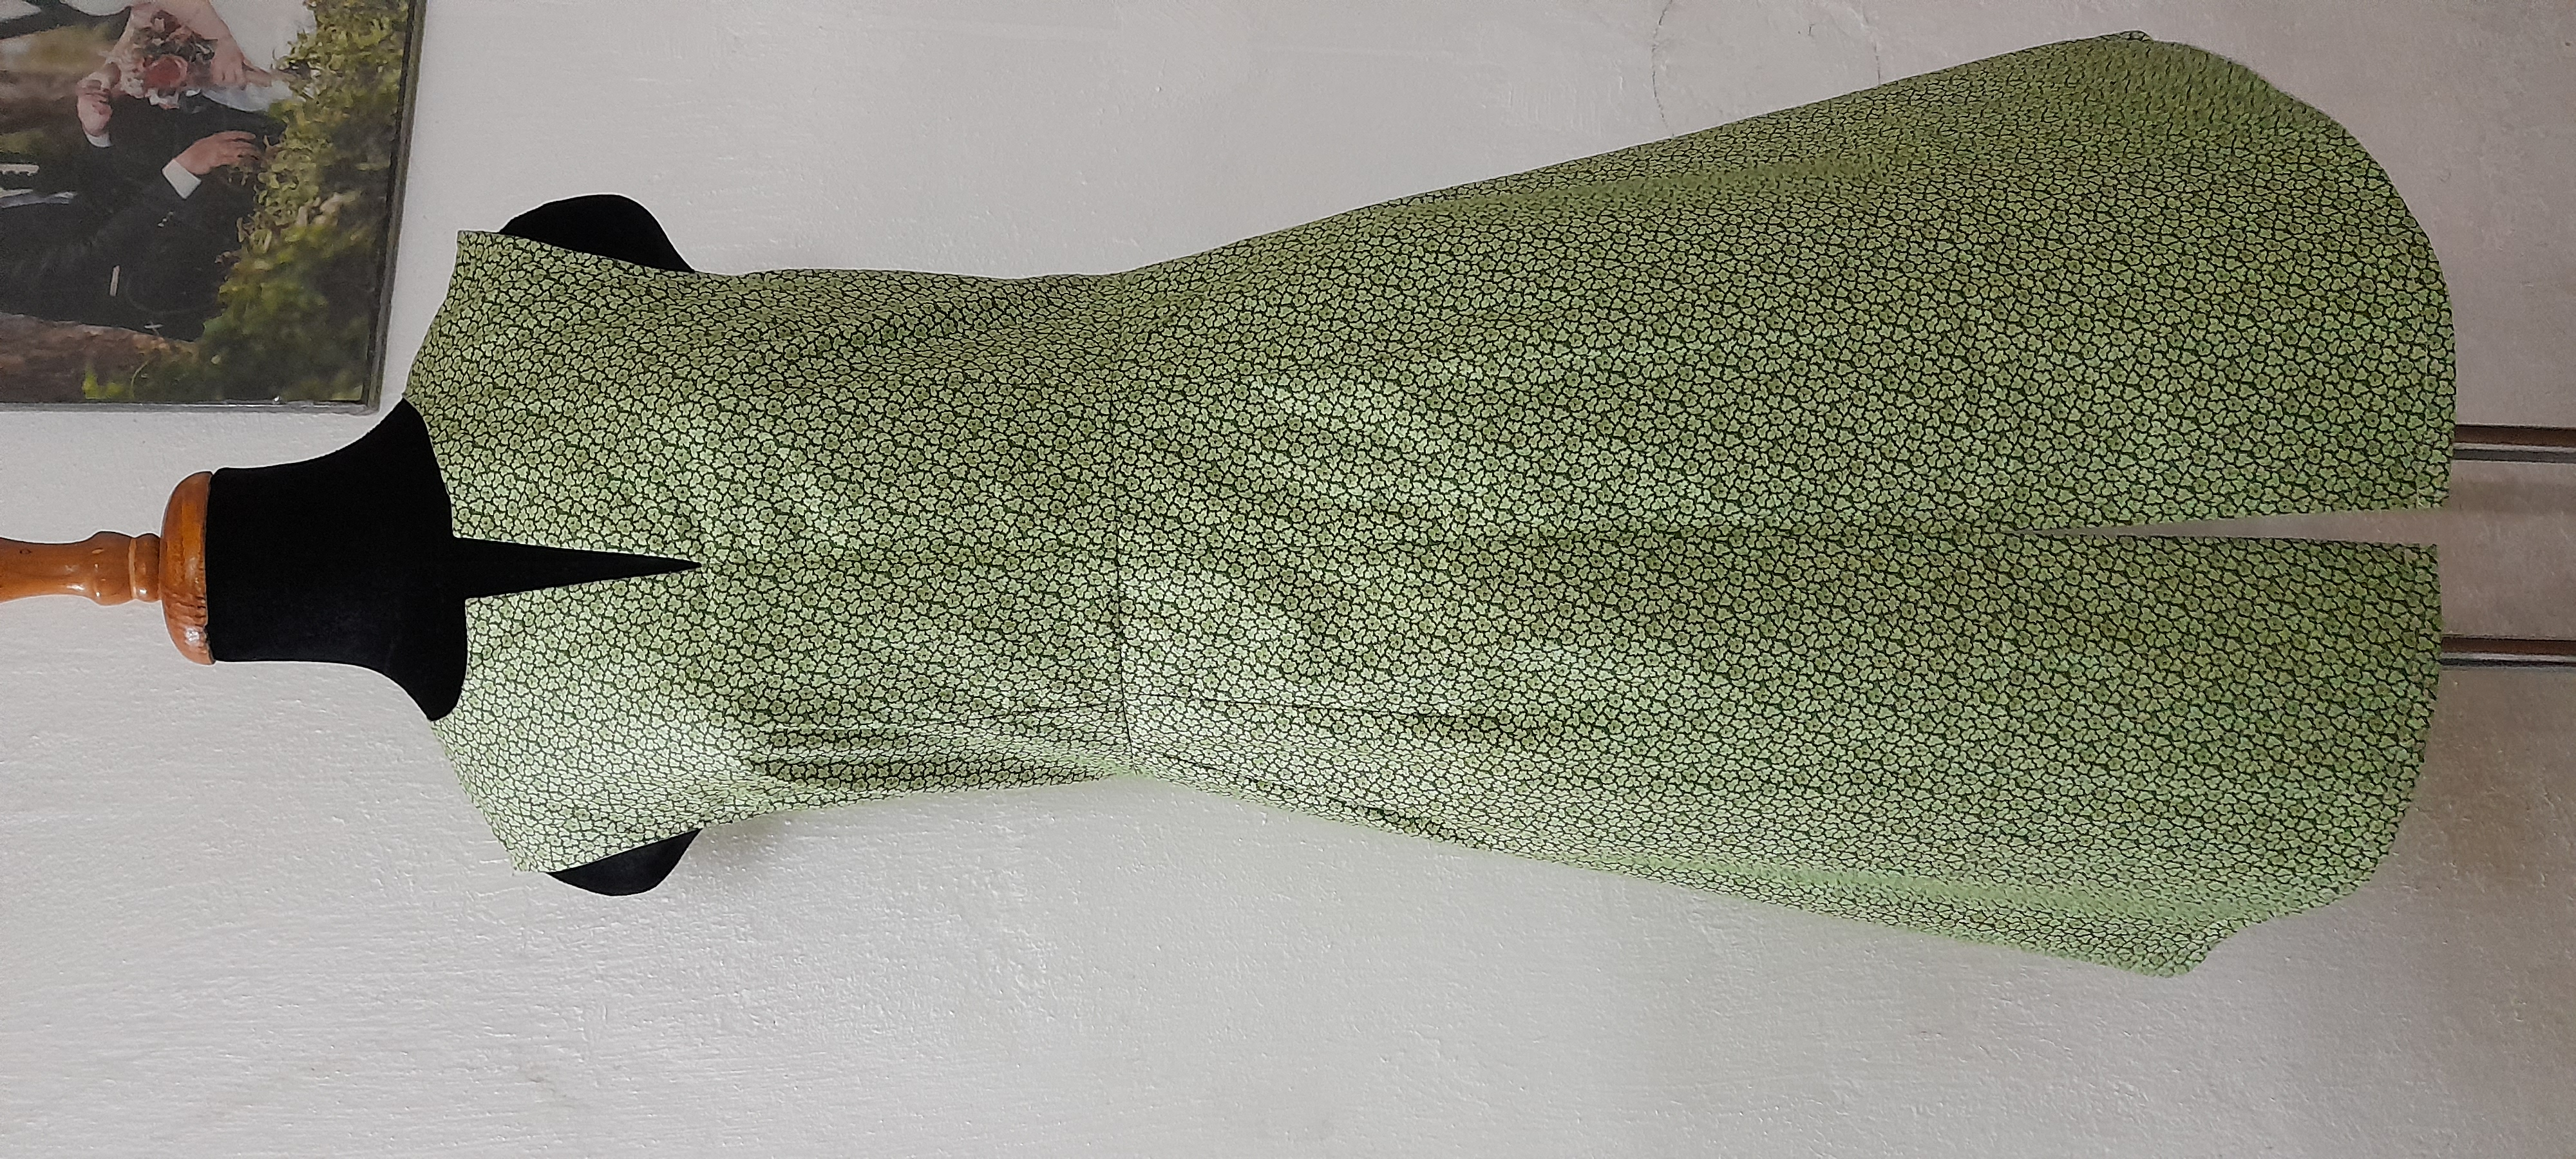 30031 - Đầm midi cổ Henley / Phạm Ngân